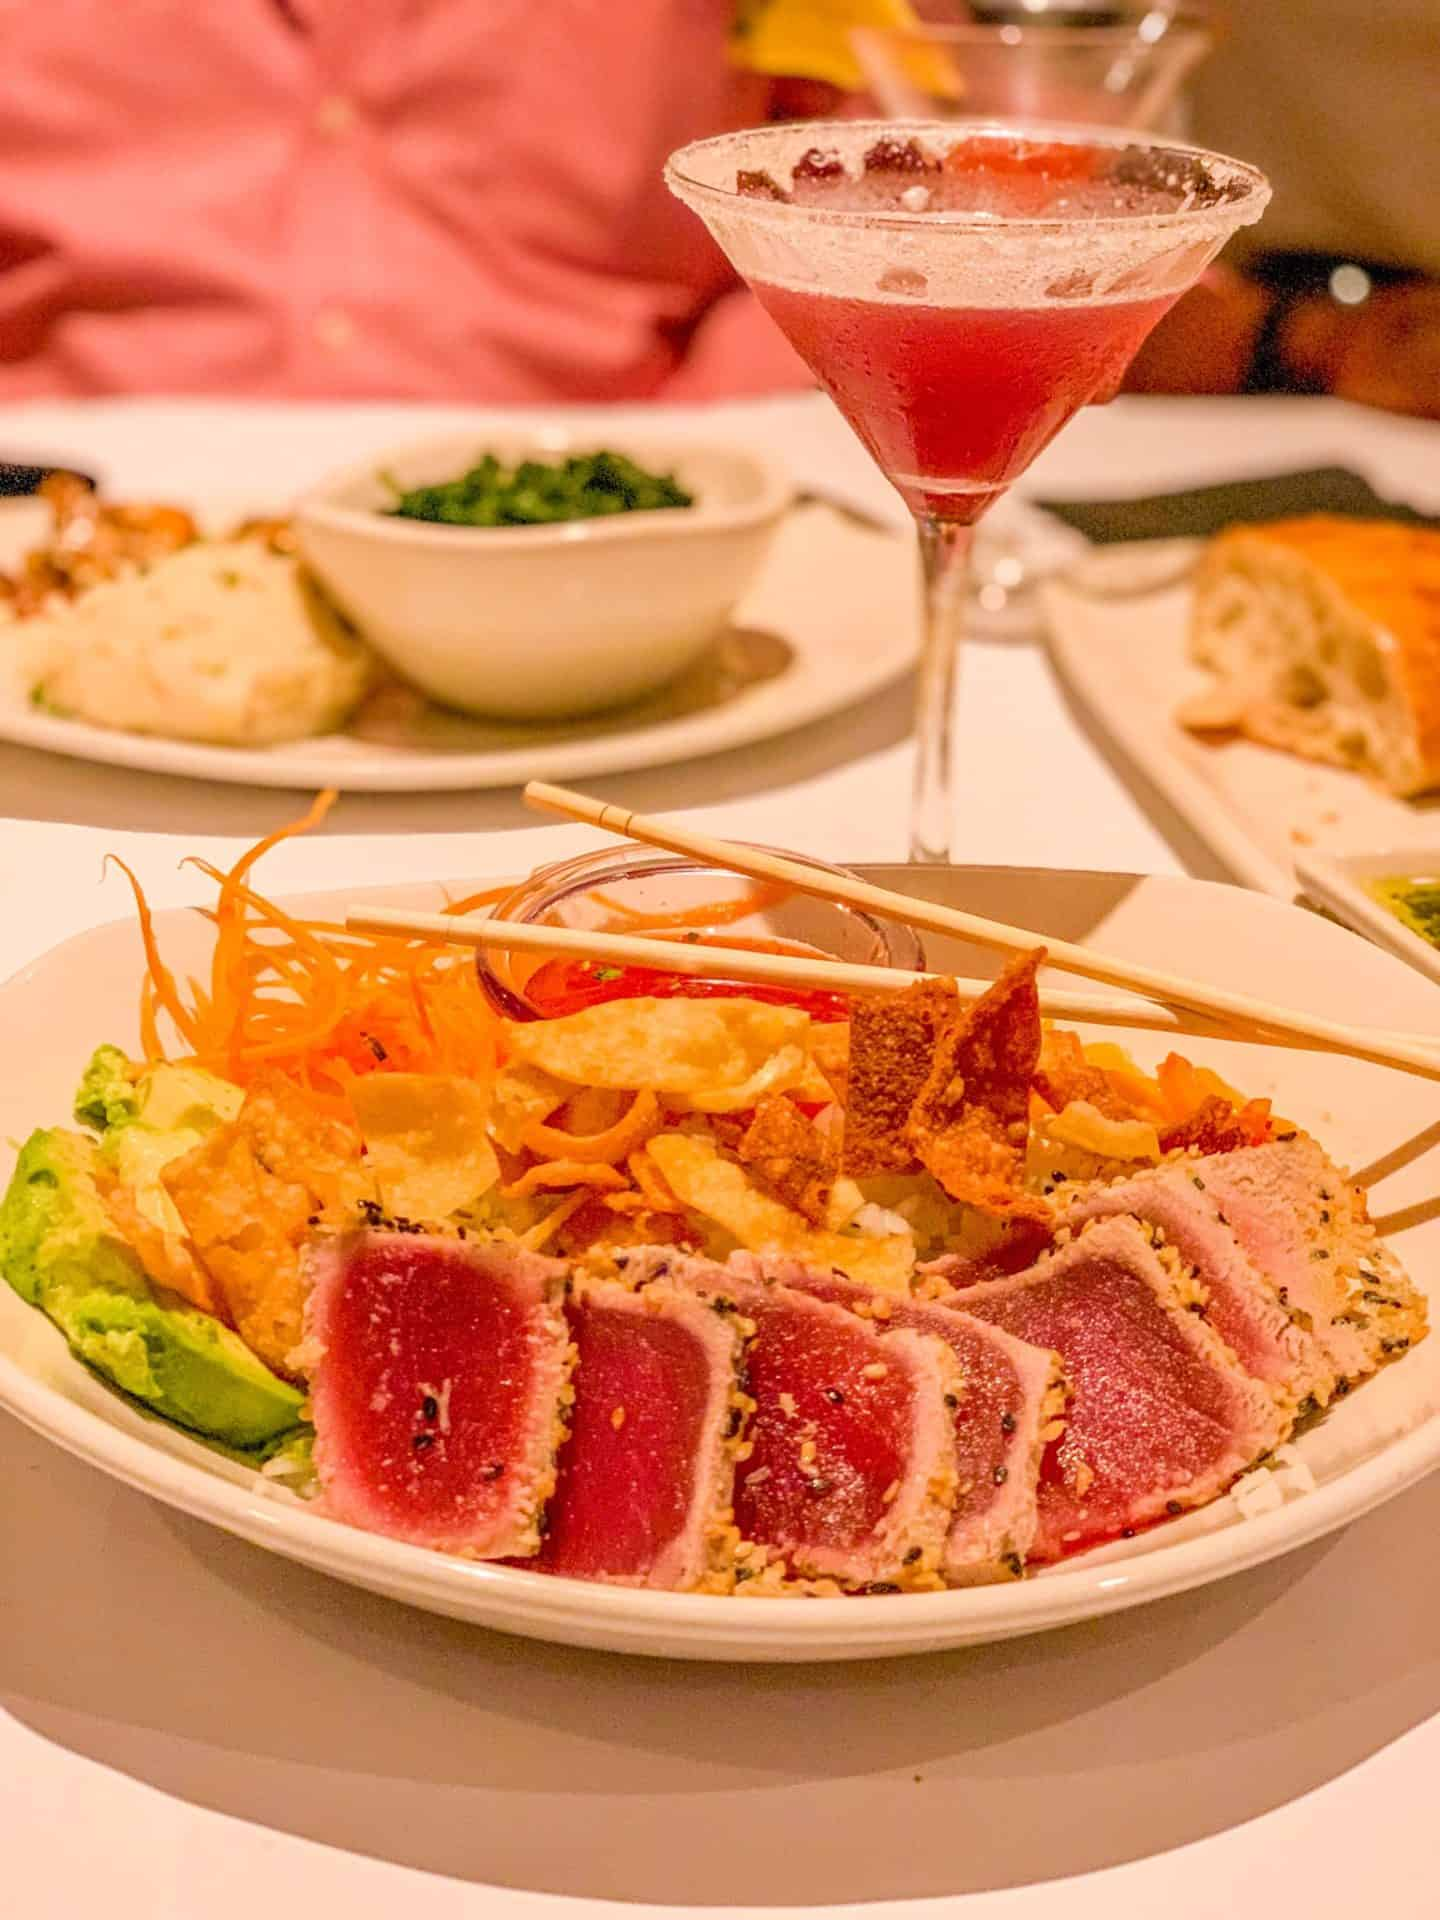 ShaundaNecole.com Our Valentine's Dinner At Bonefish Grill- Spicy Tuna Bowl